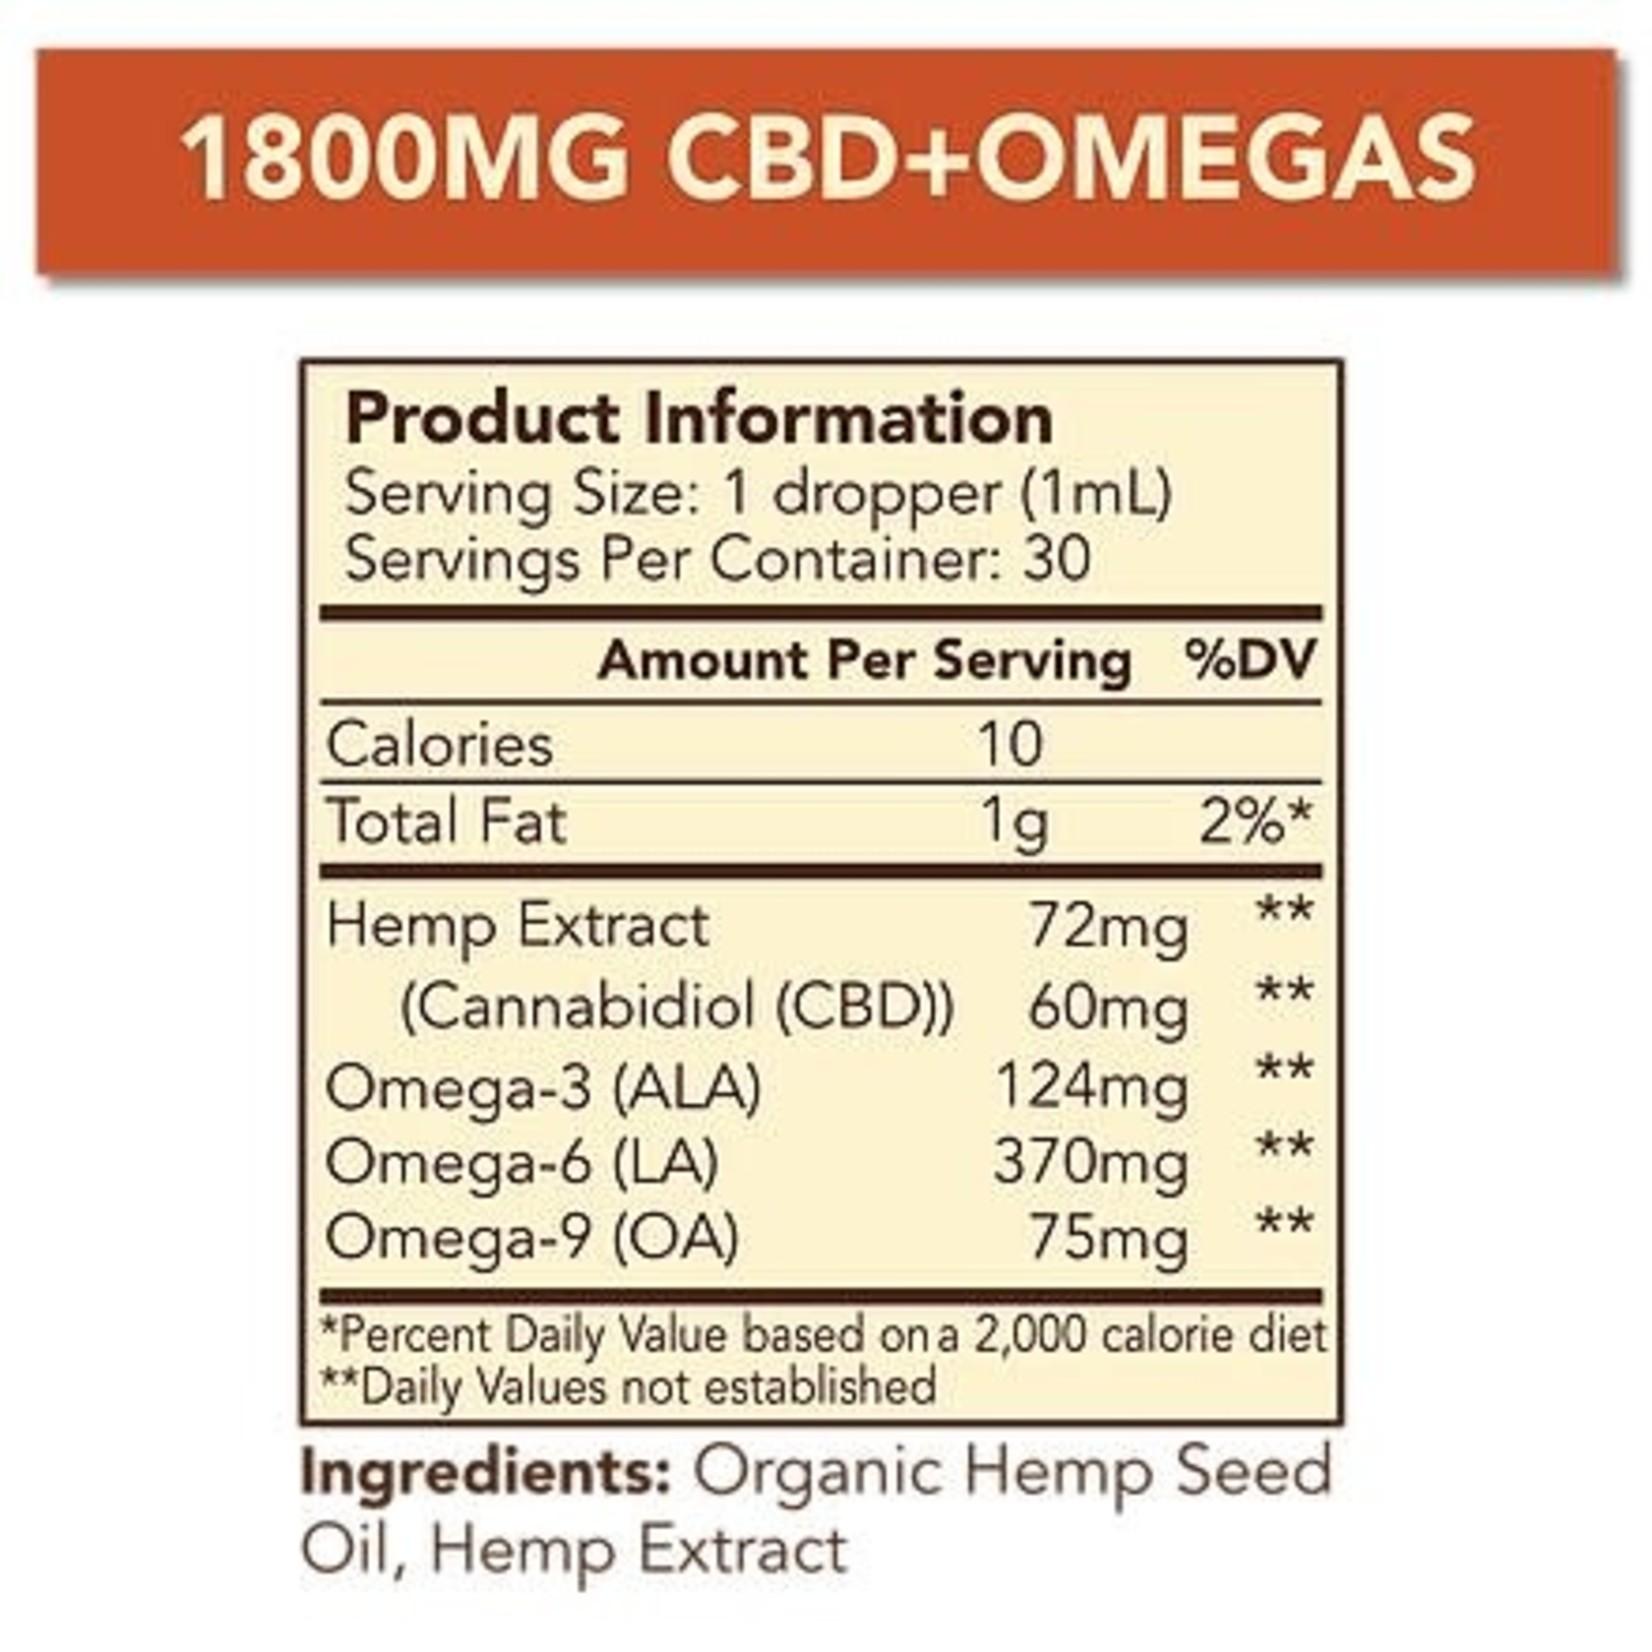 Cypress Hemp Cypress CBD + Omegas Broad Spectrum 1800mg